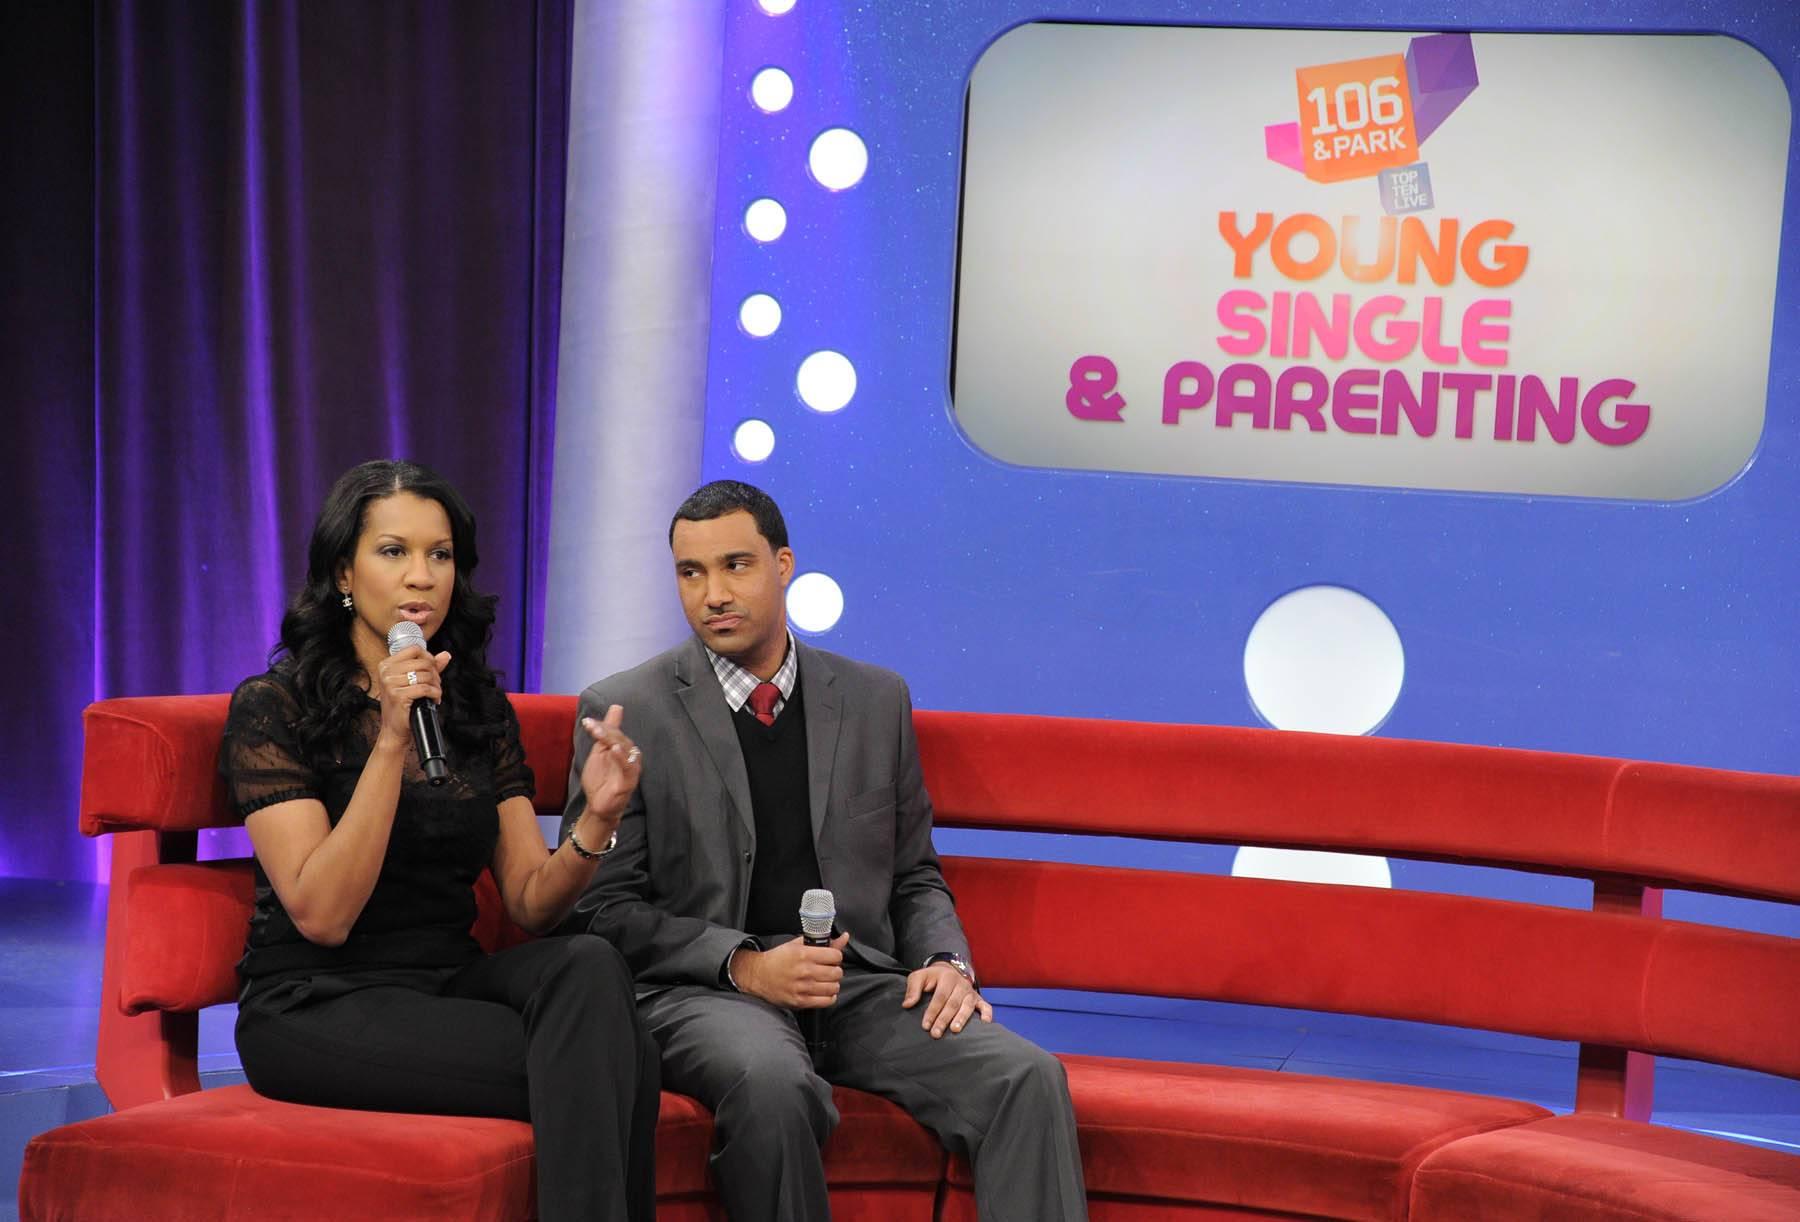 The Pros - Dr. Michelle and Dr. Alduan Tarrt at 106 & Park, January 30, 2012. (Photo: John Ricard / BET)